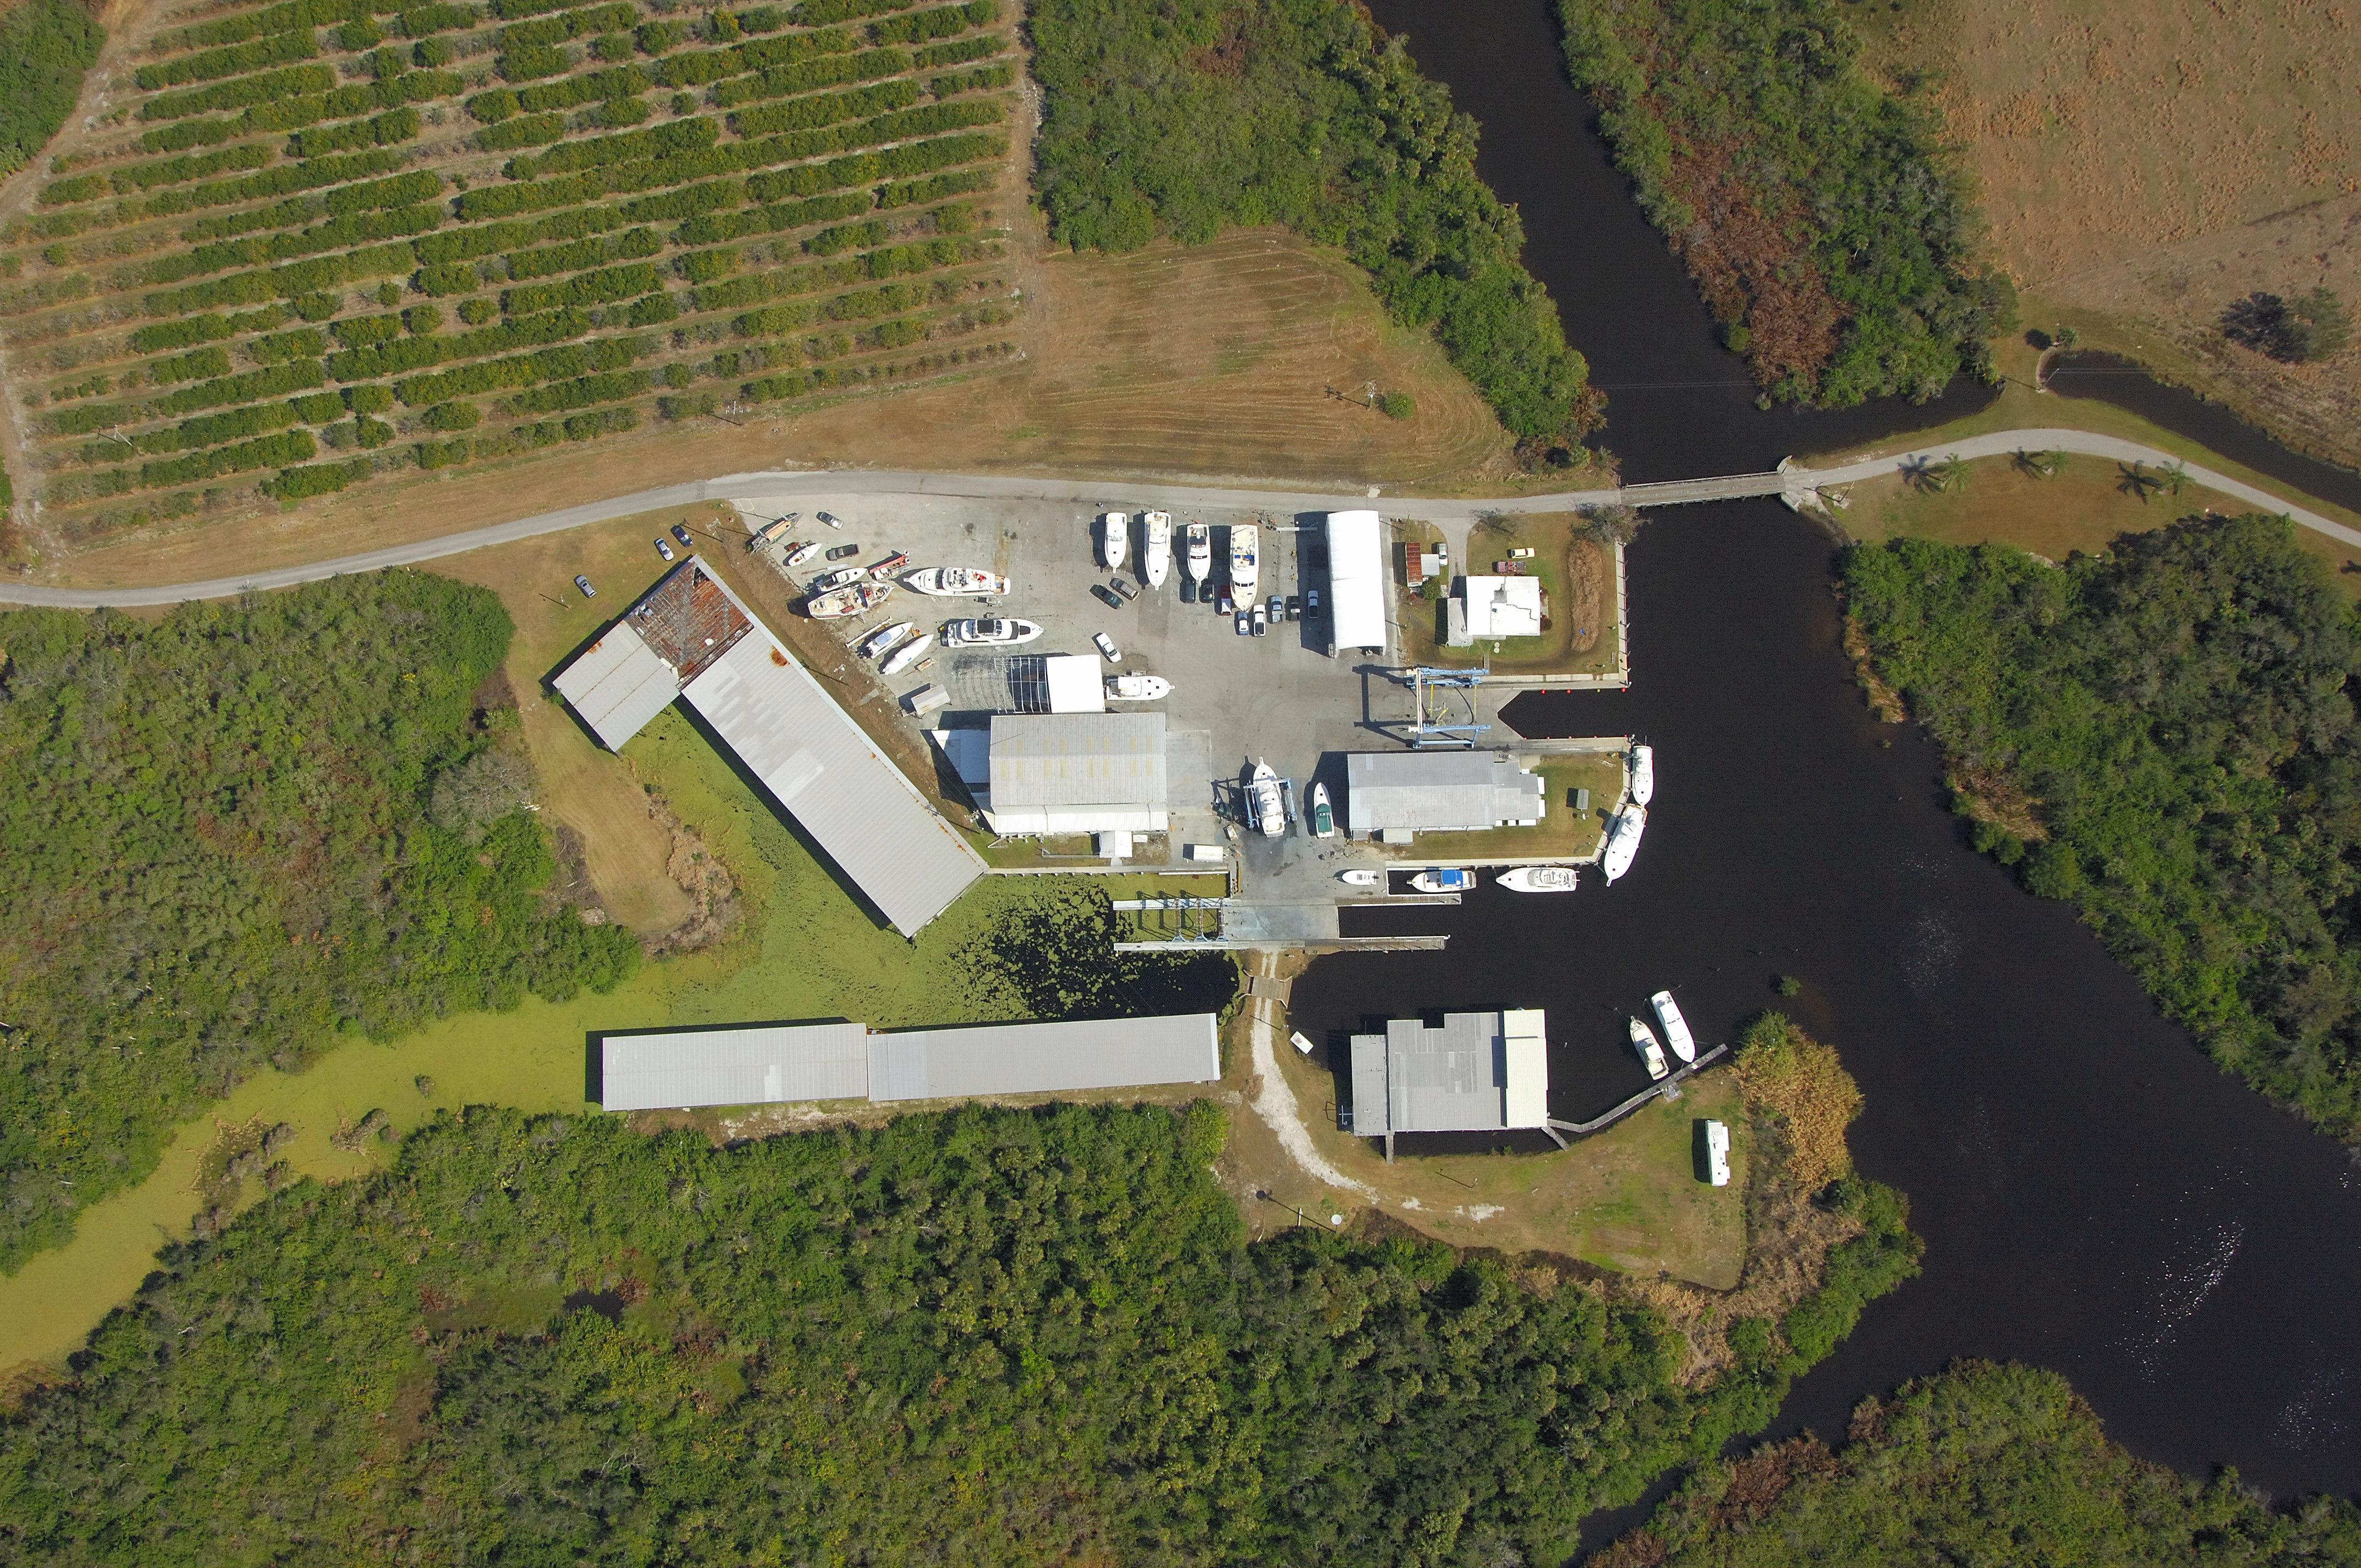 Owl Creek Boat Works Amp Storage In Alva Fl United States